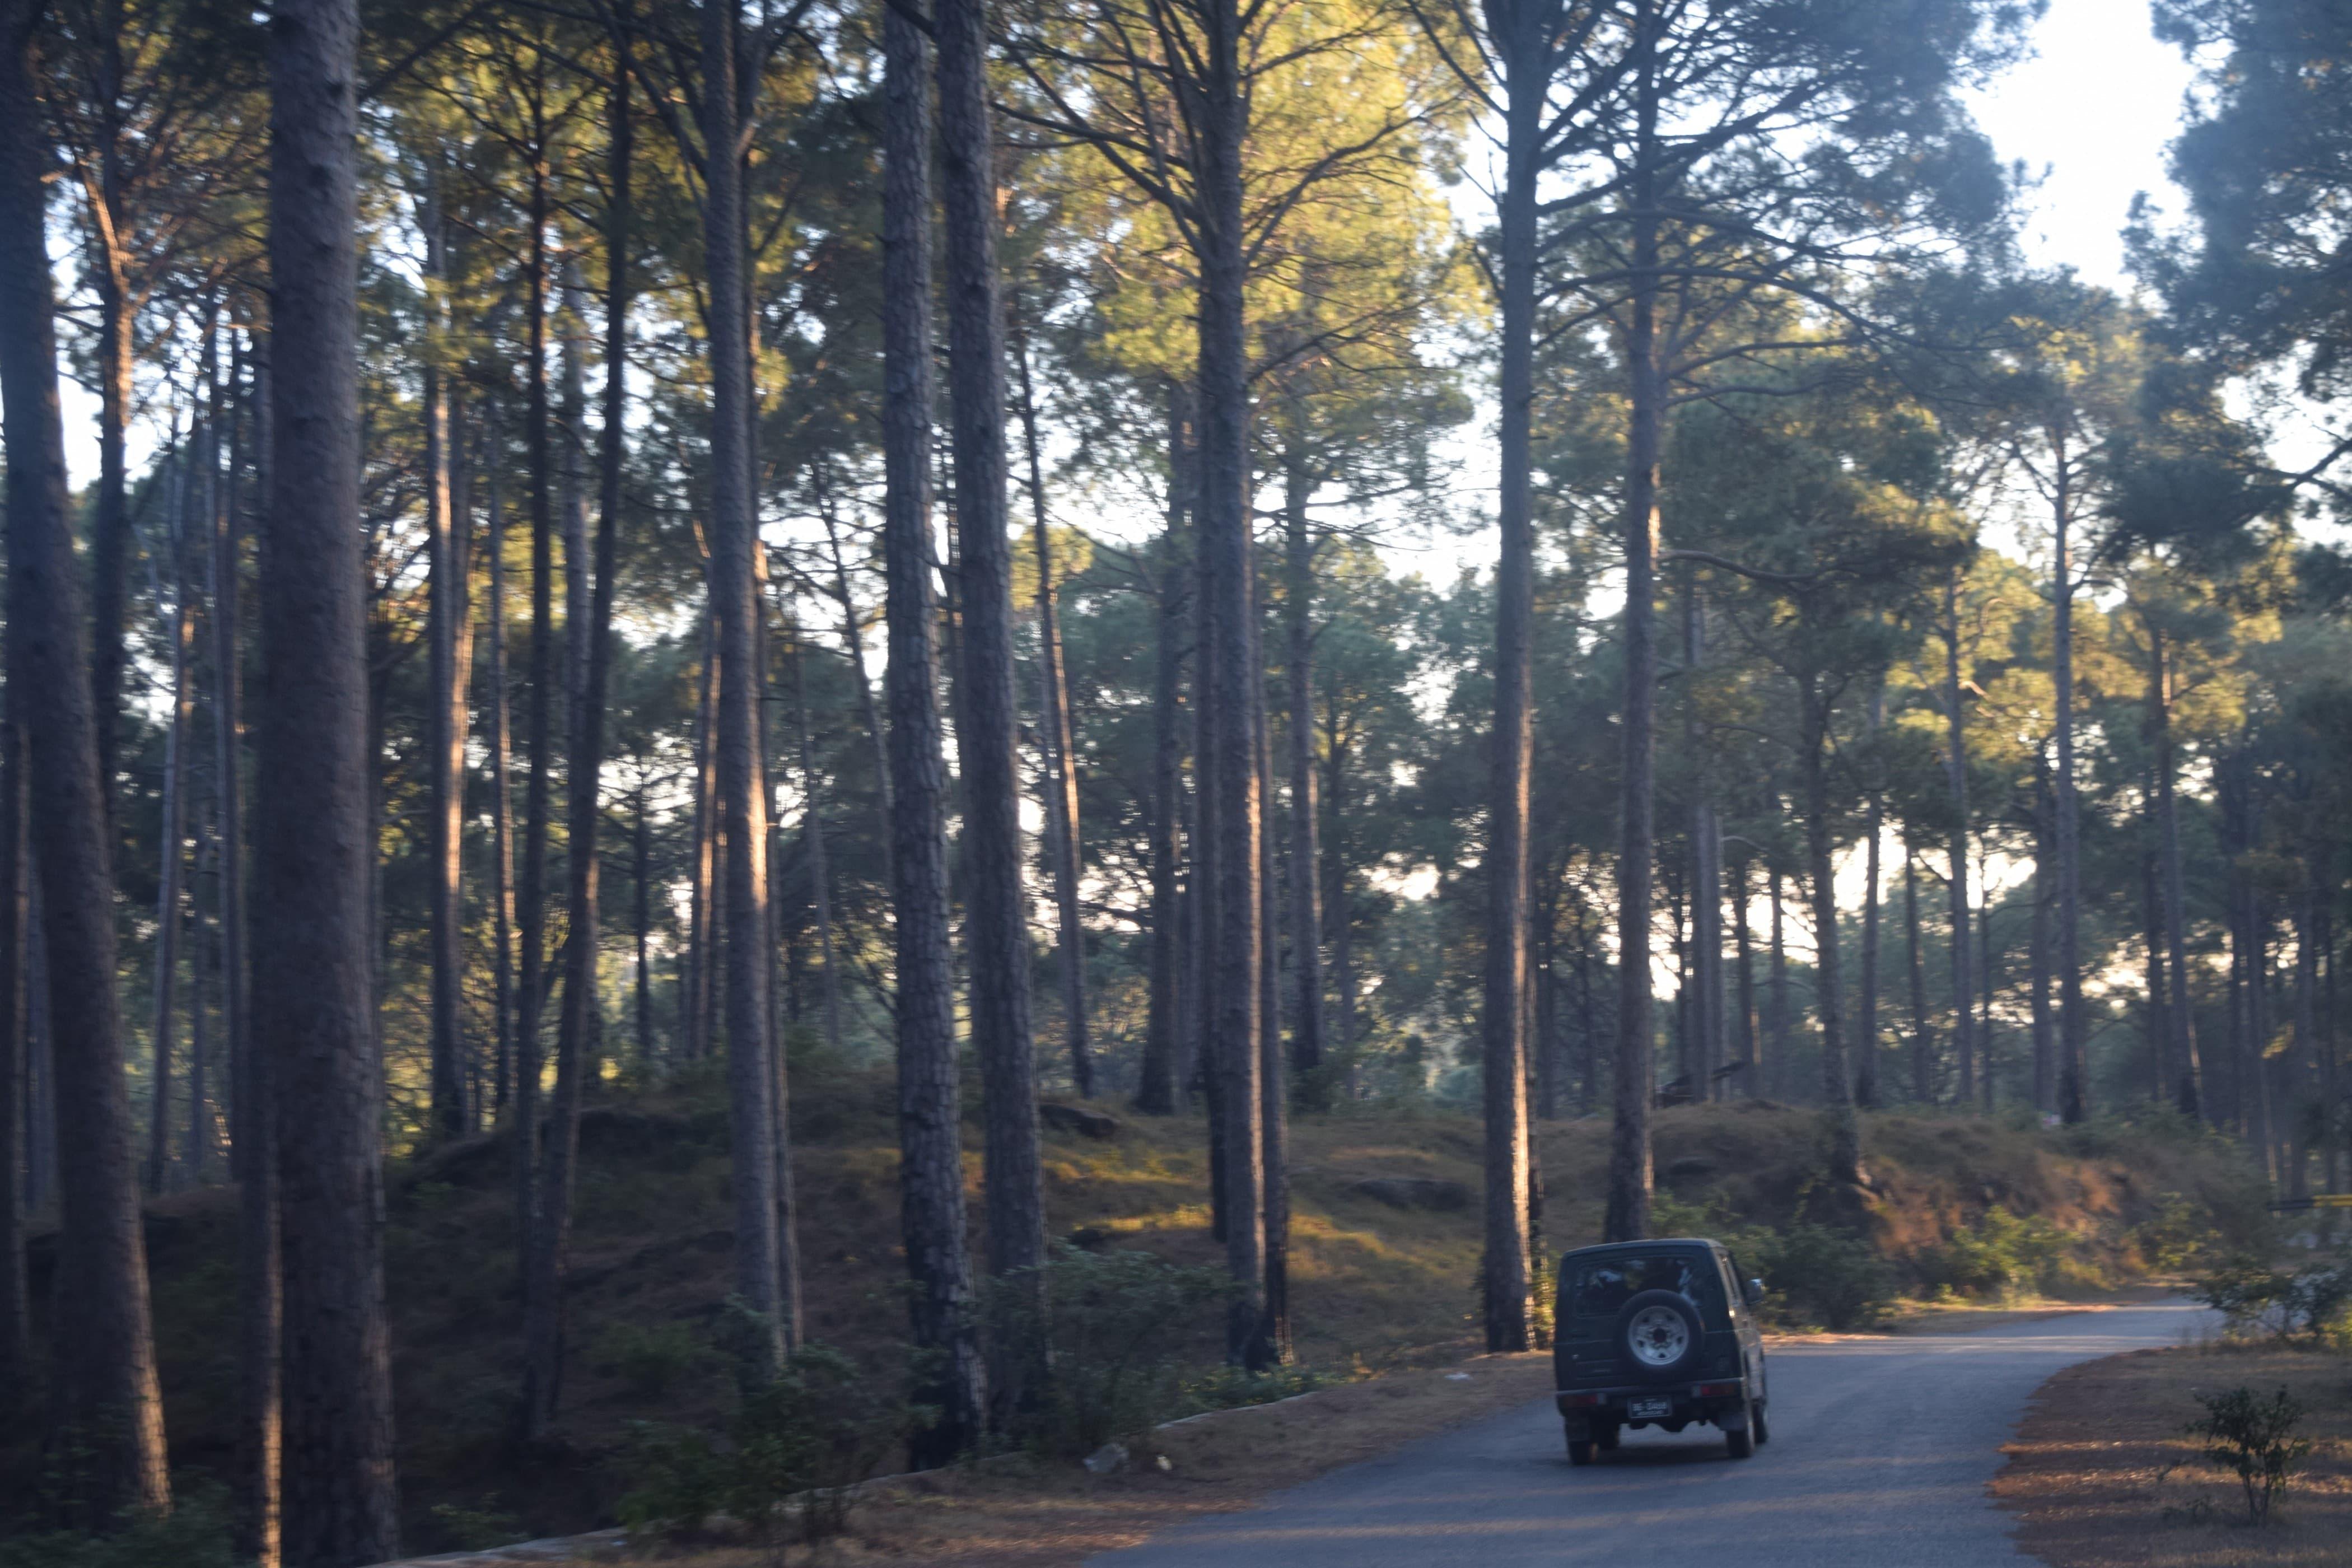 The dense pines of Ariari.